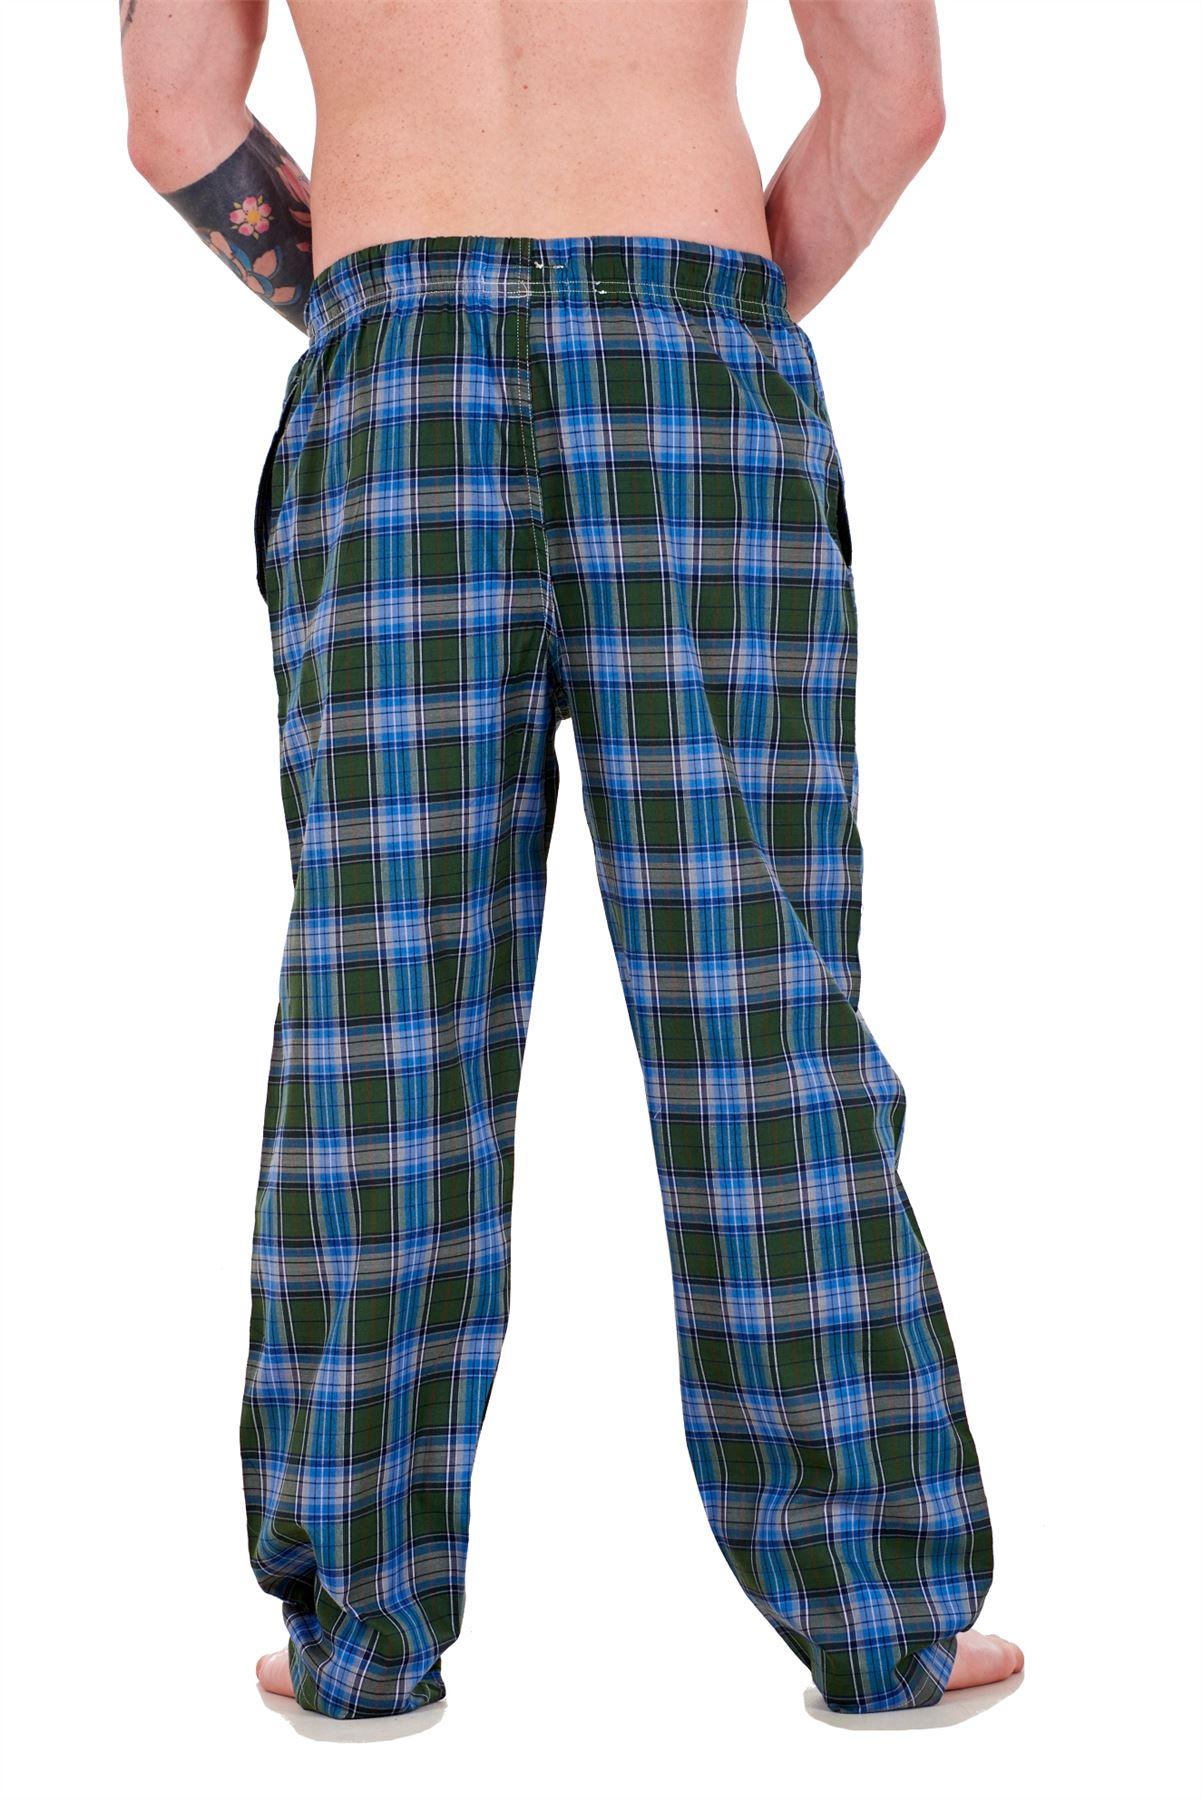 Mens-Pyjama-Bottoms-Rich-Cotton-Woven-Check-Lounge-Pant-Nightwear-Big-3XL-to-5XL Indexbild 32